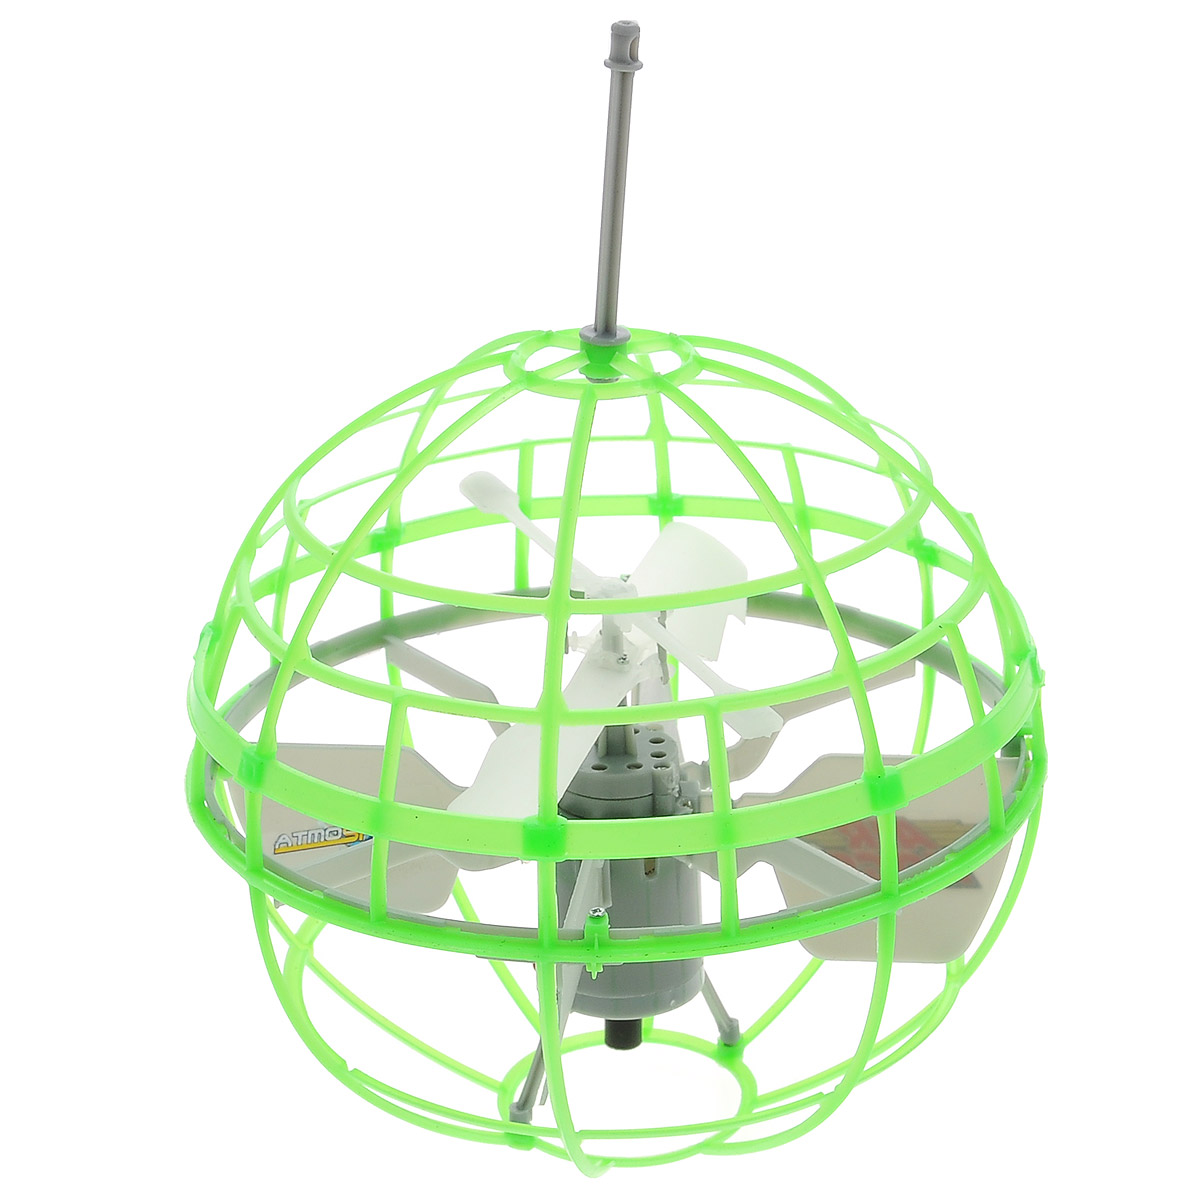 Air Hogs Игрушка на радиоуправлении Atmosphere Axis цвет зеленый air hogs машина вездеход каскадер air hogs желтая